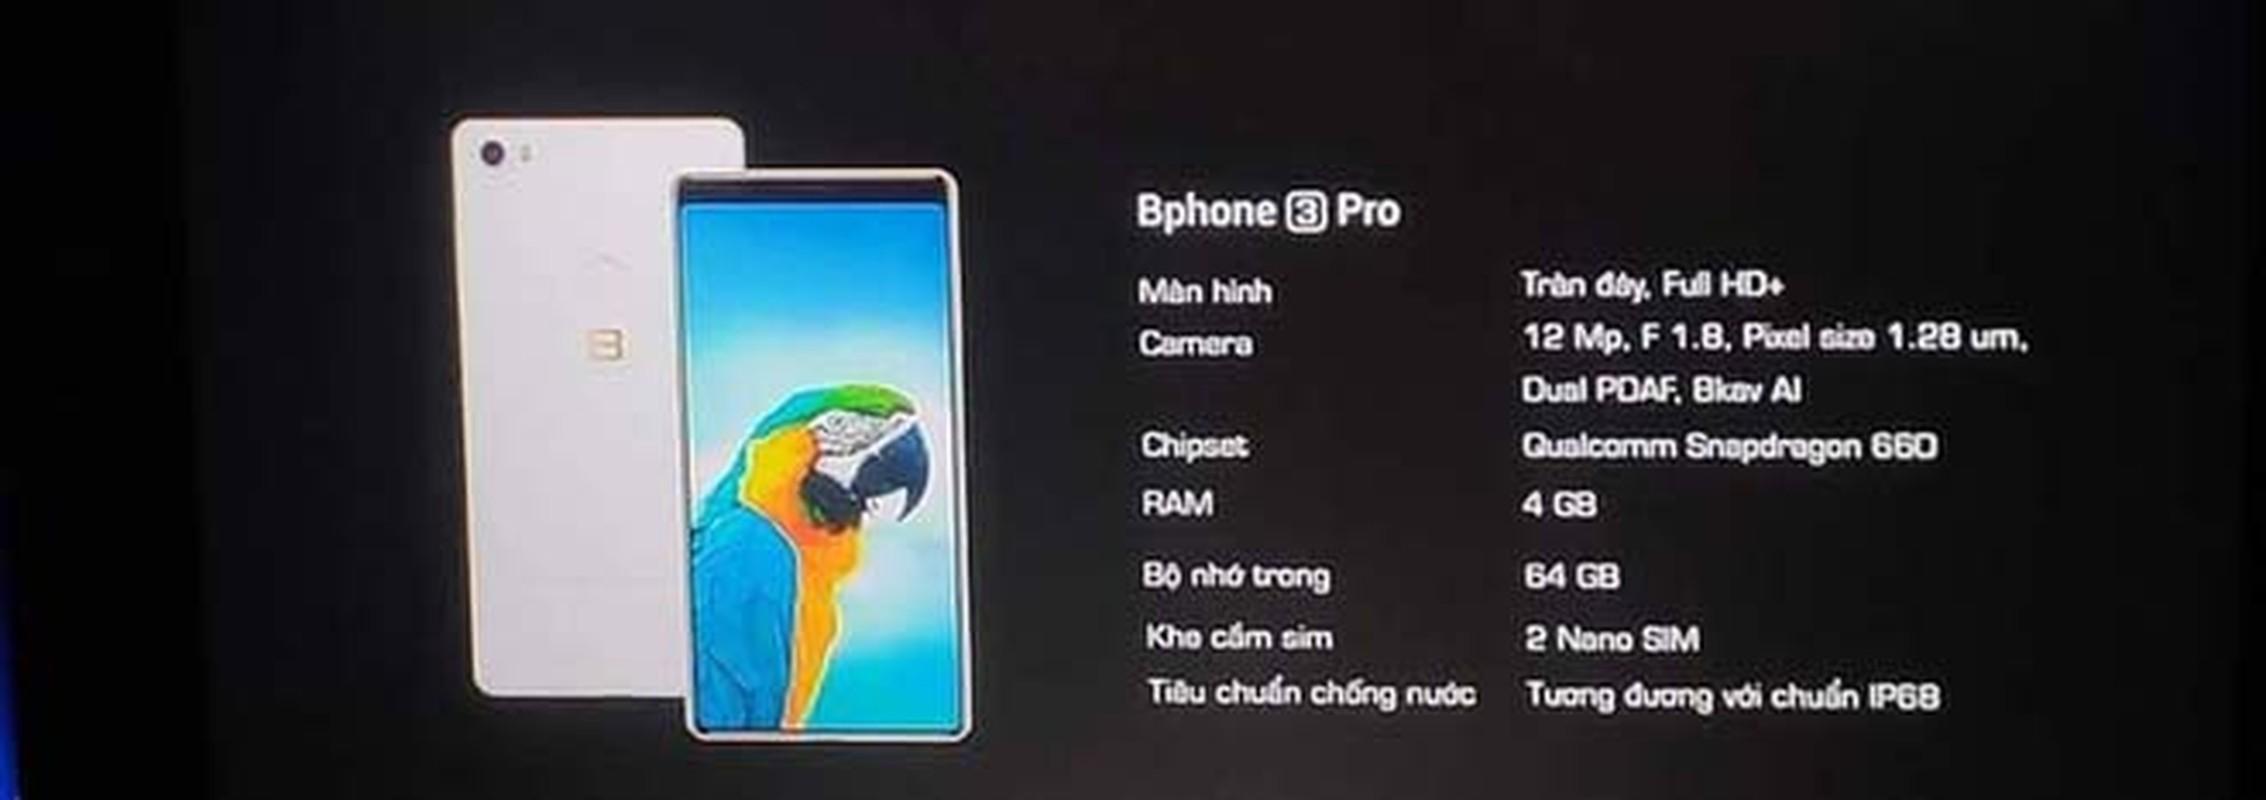 Quang canh le ra mat Bphone 3 truoc gio G-Hinh-7